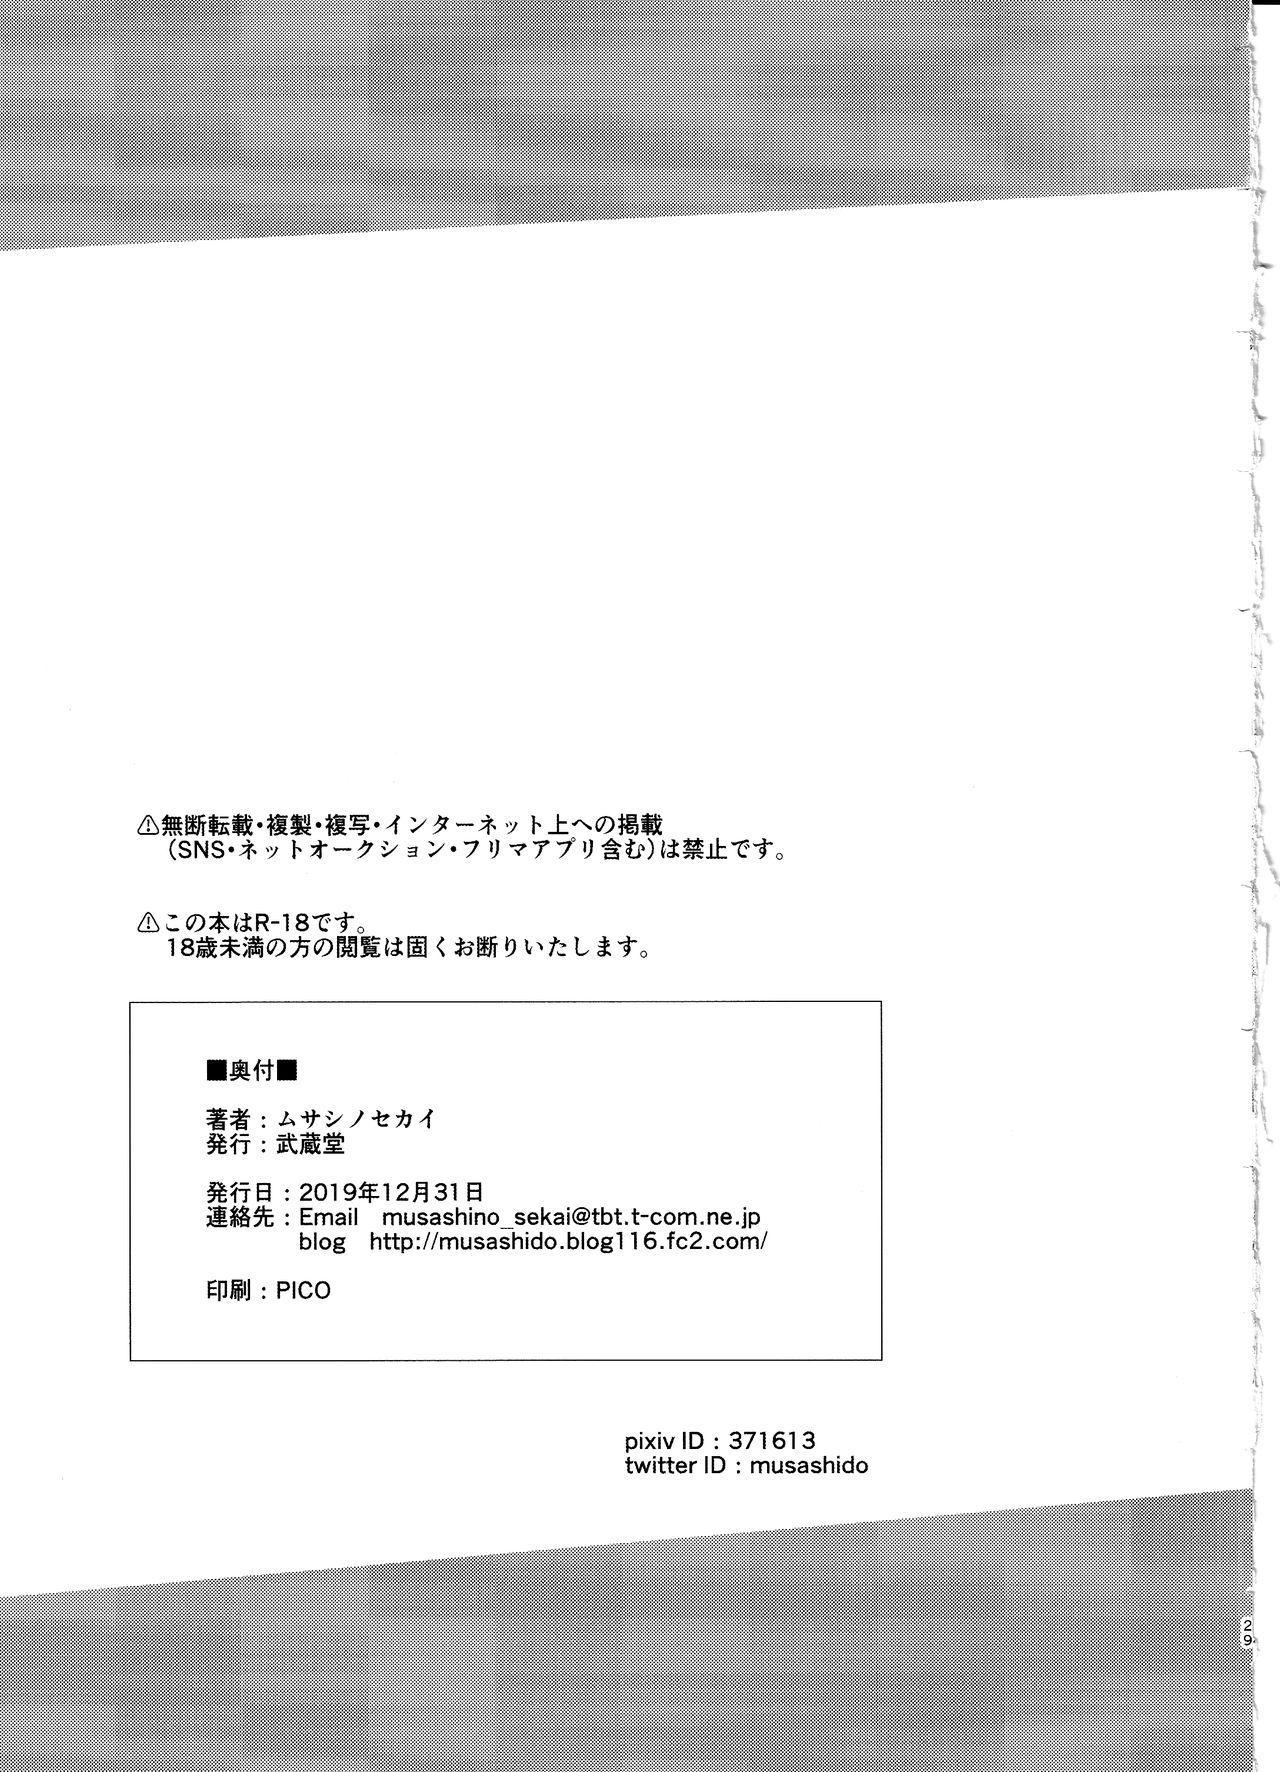 NAMAIKI GAL BITCH FUTANARIX 28